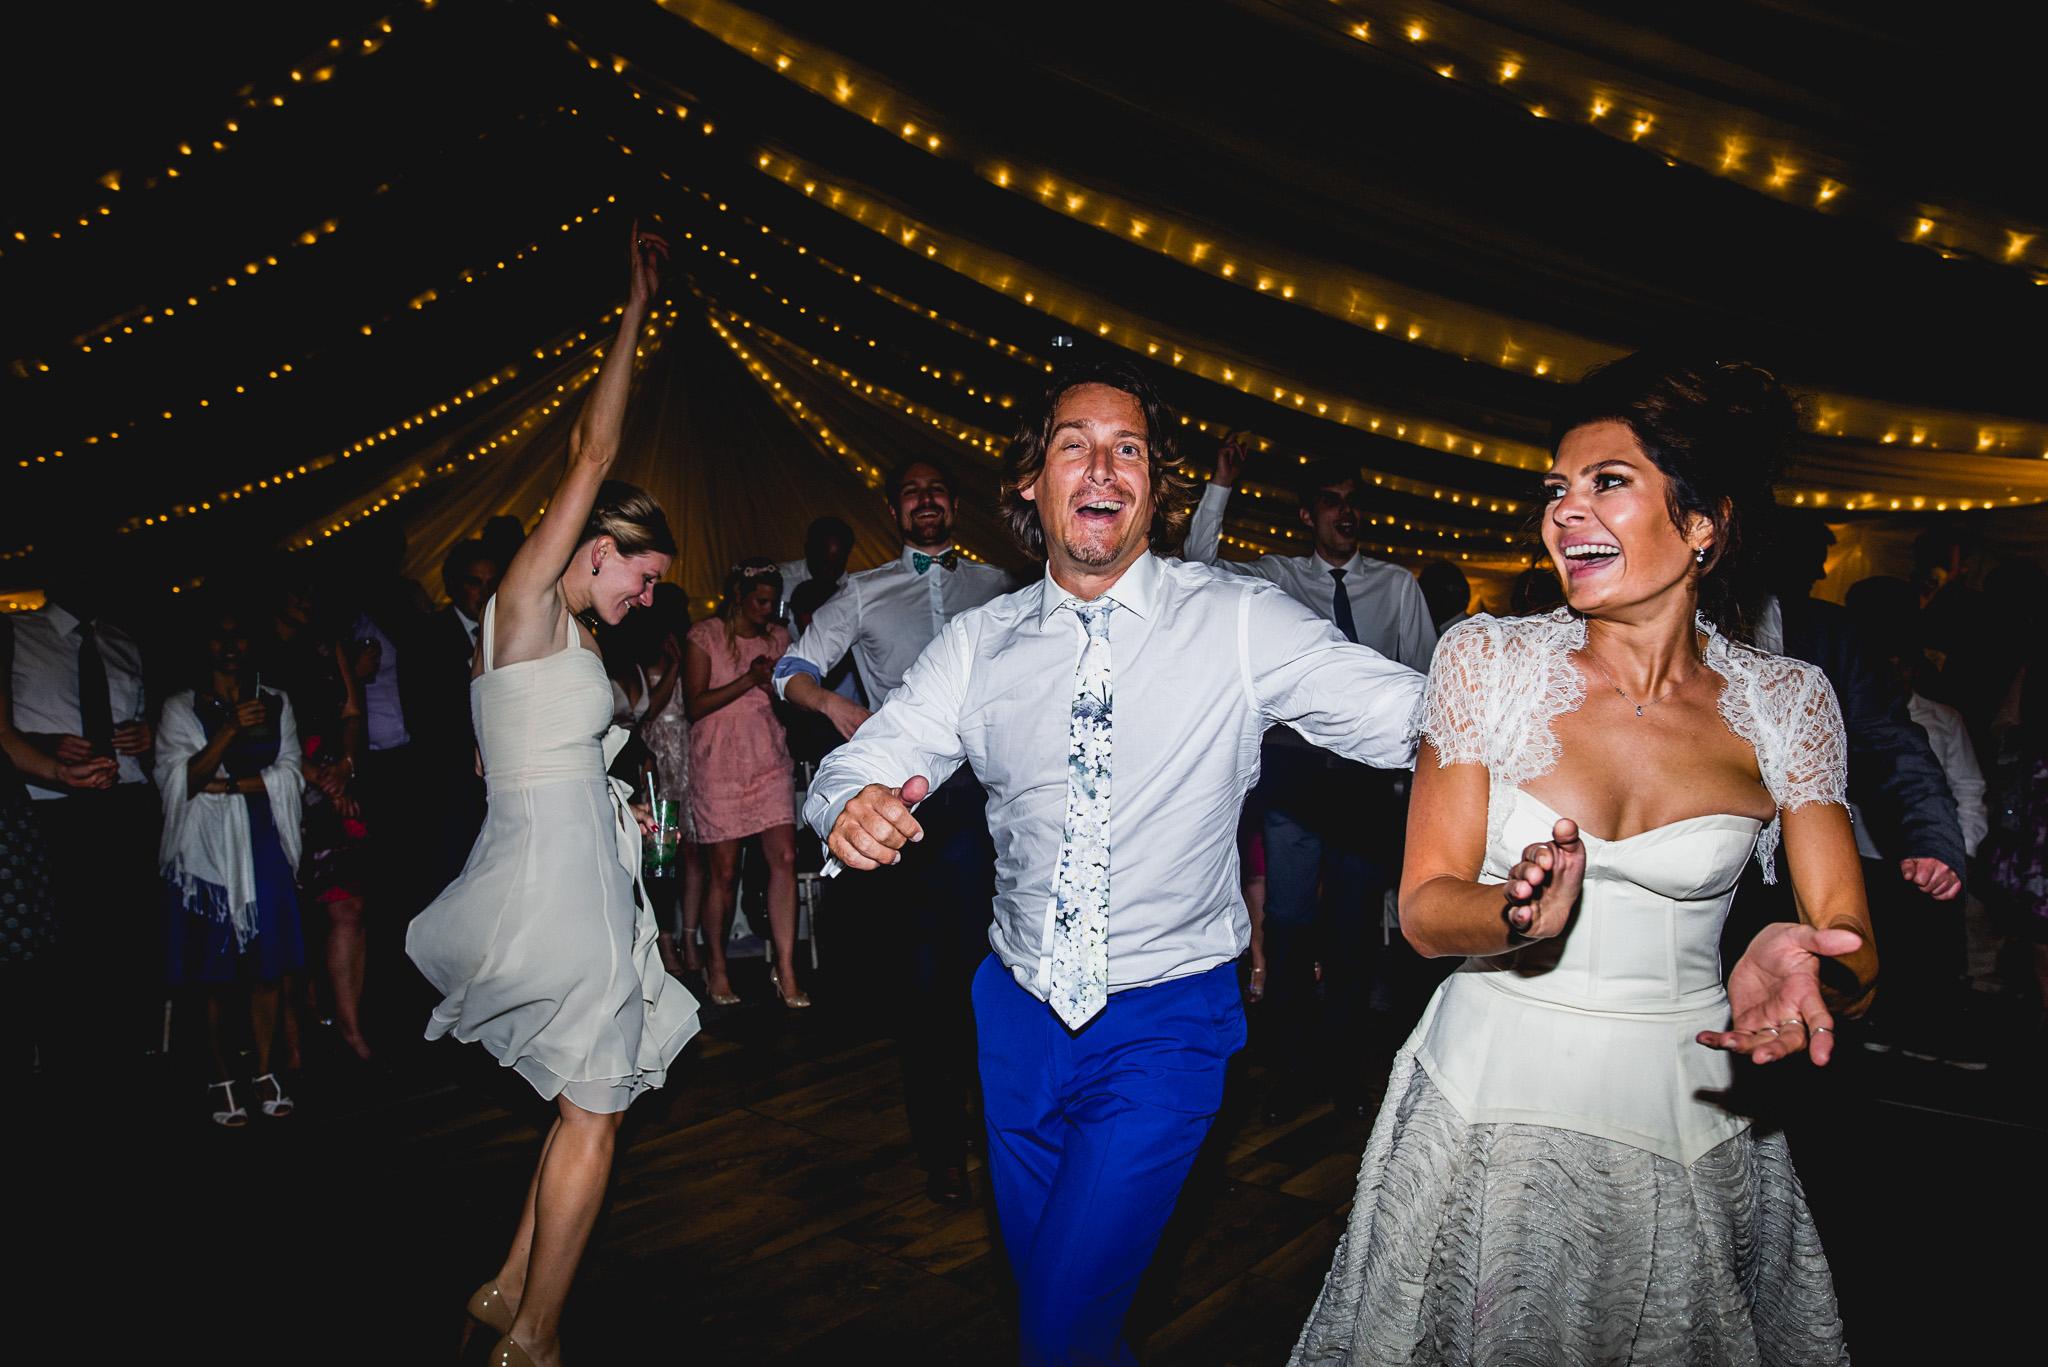 Lara & Jack Wedding 220815 by Barney Walters_1069_BW2_1156